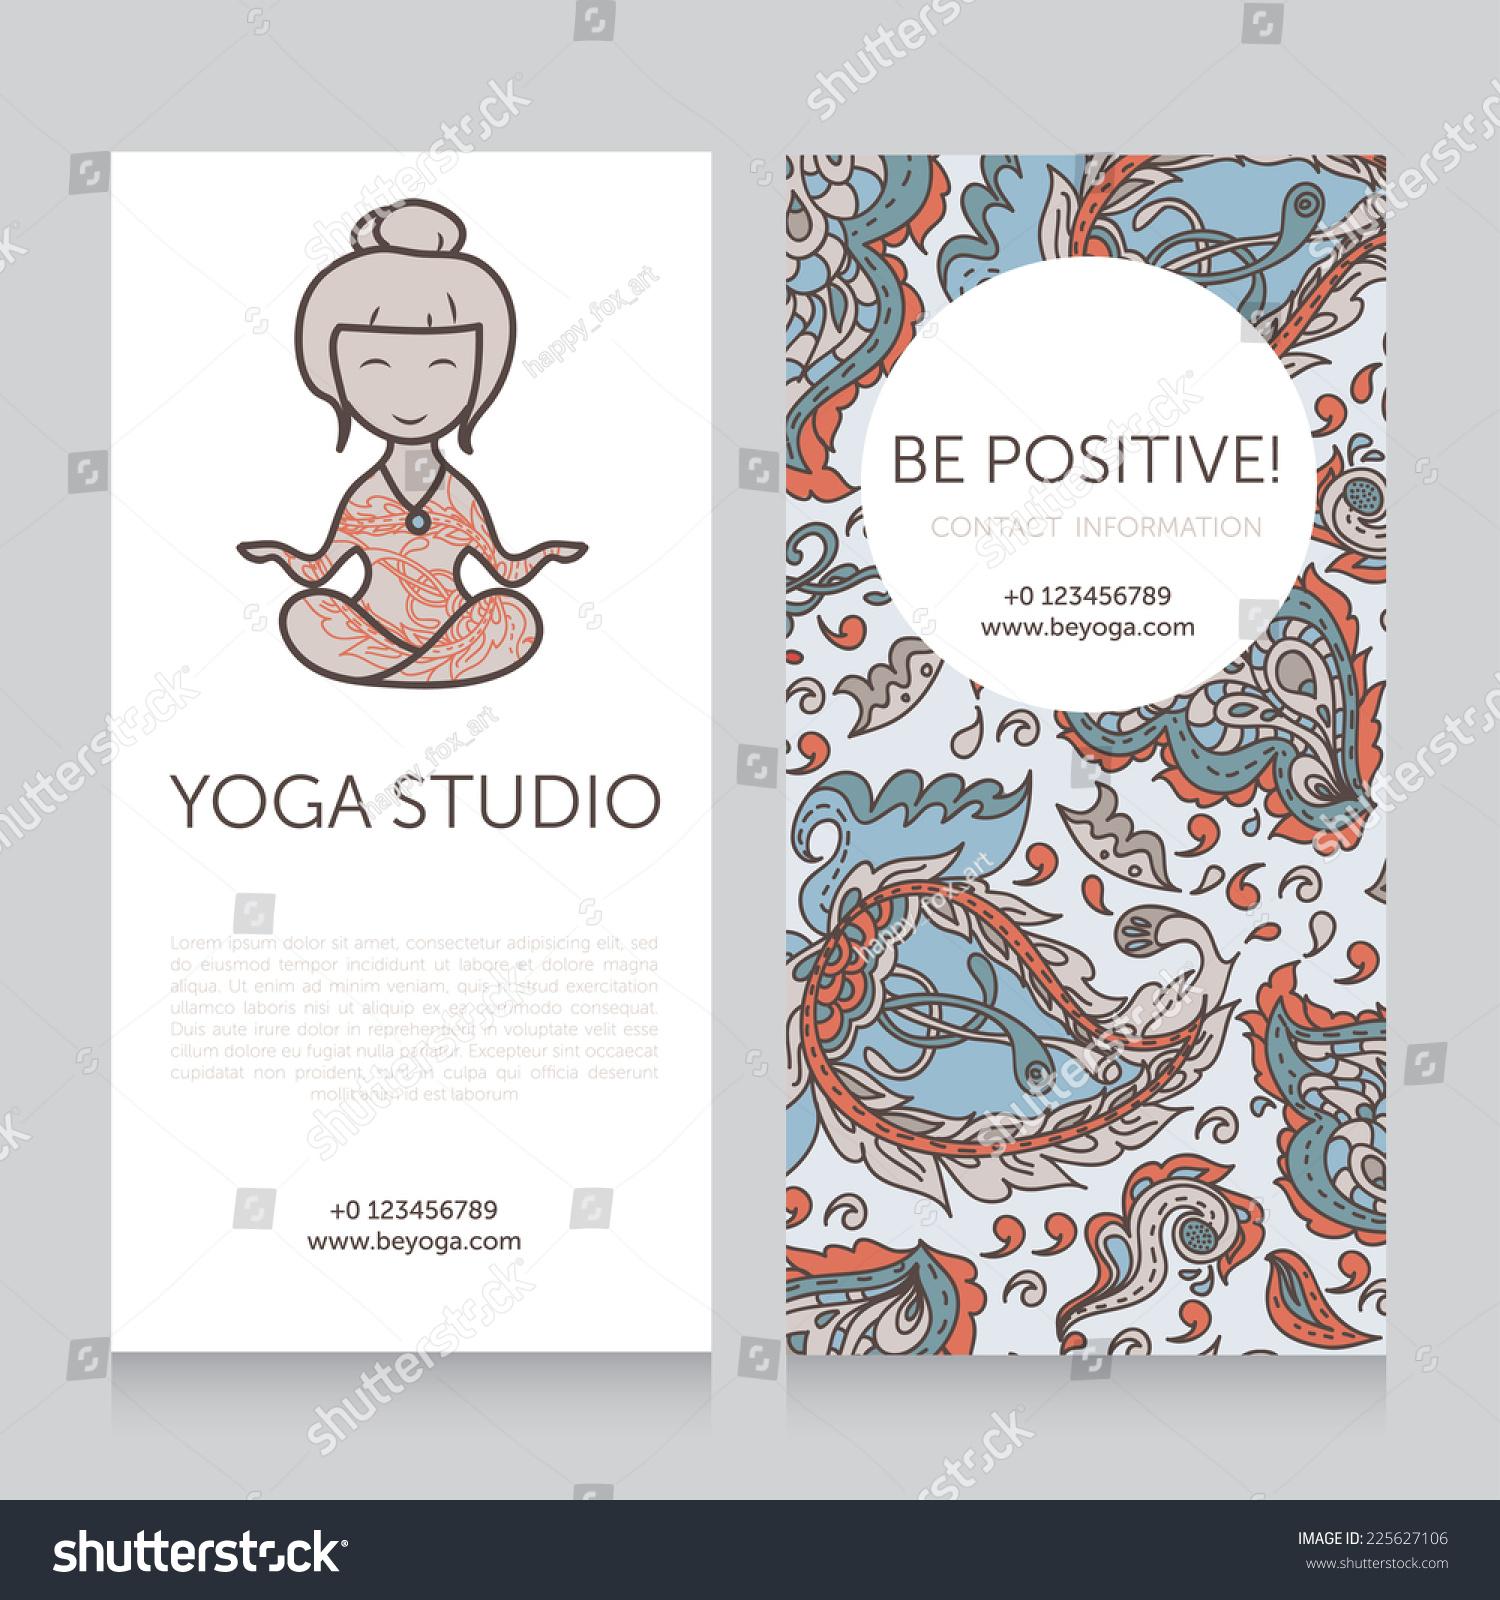 Paisley design template yoga studio business stock vector paisley design template for yoga studio business card vector illustration magicingreecefo Images